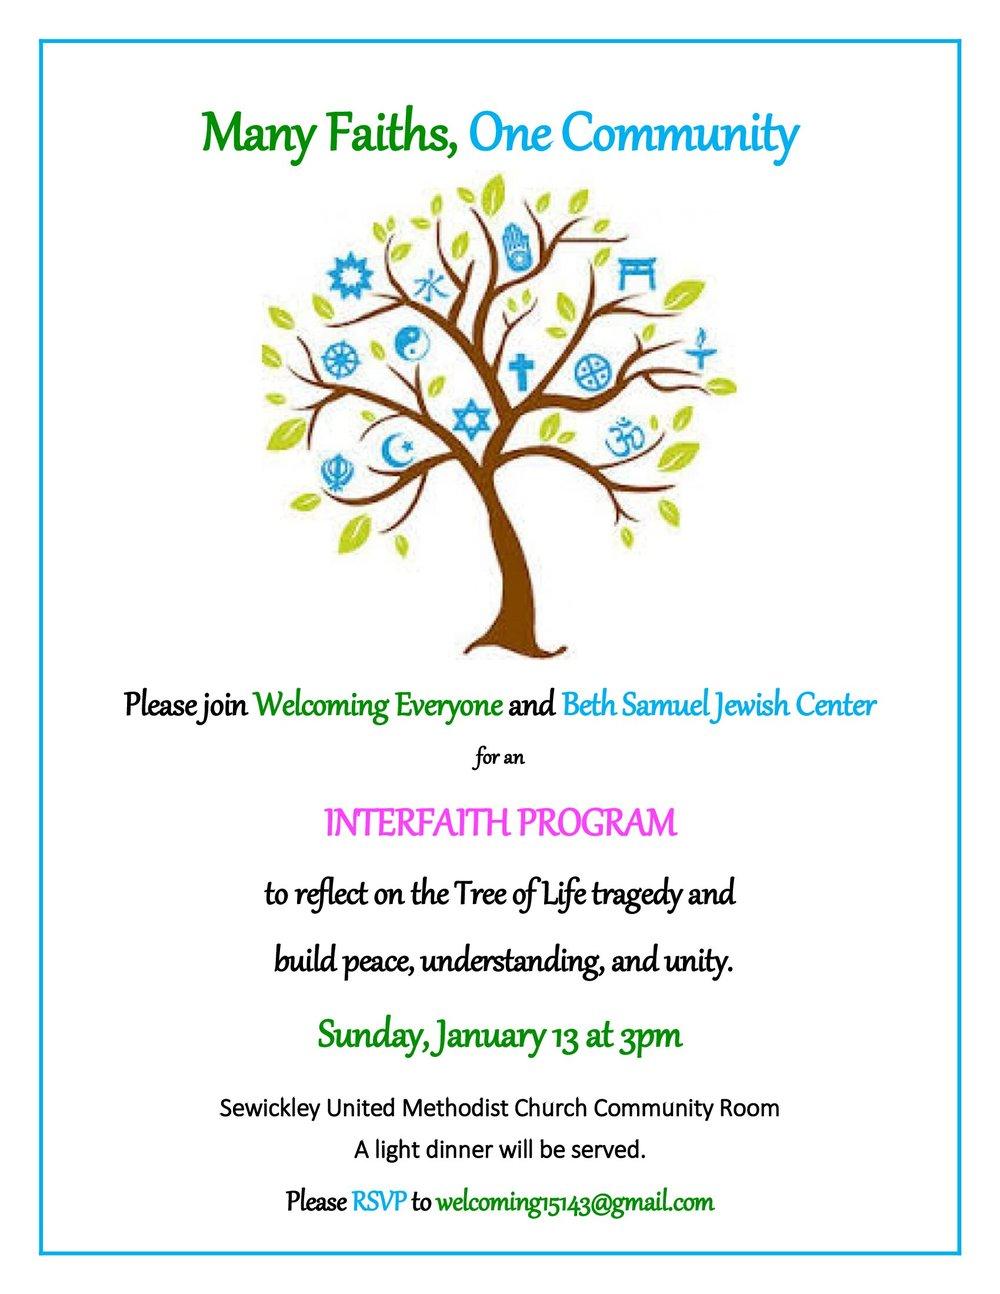 WE_Interfaith_Program_flyer.jpg